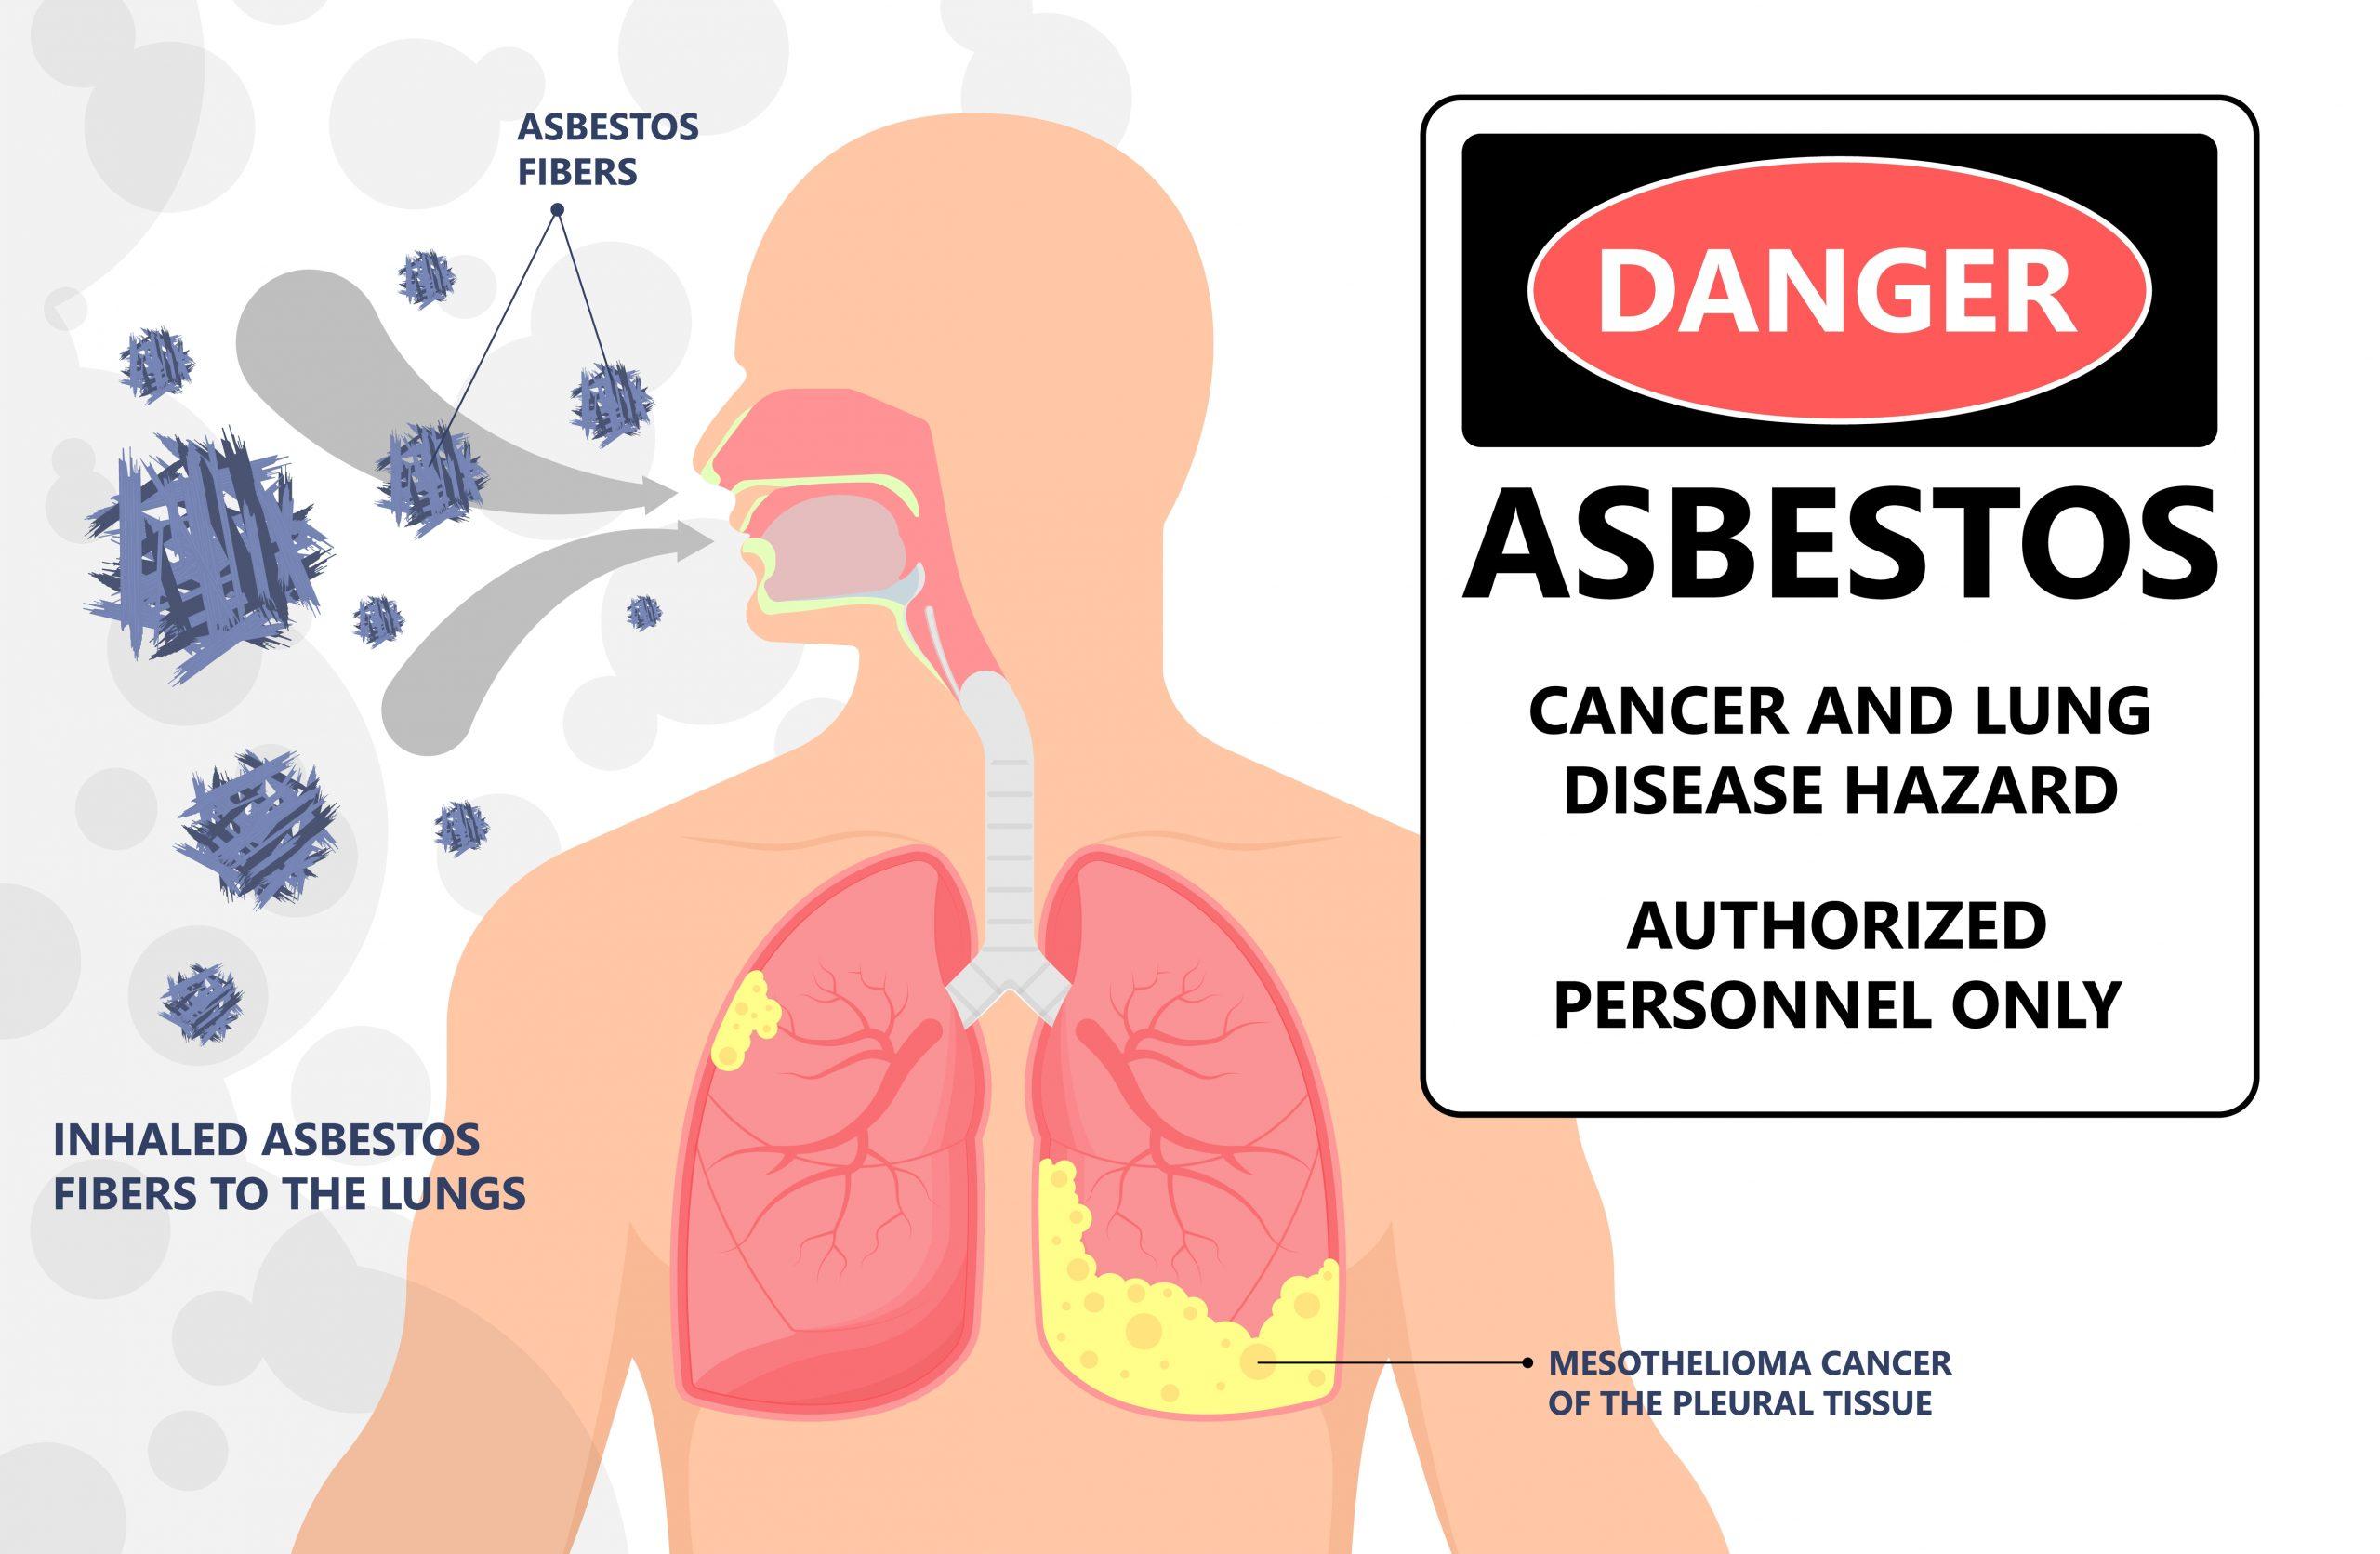 Effects of Asbestos Exposure